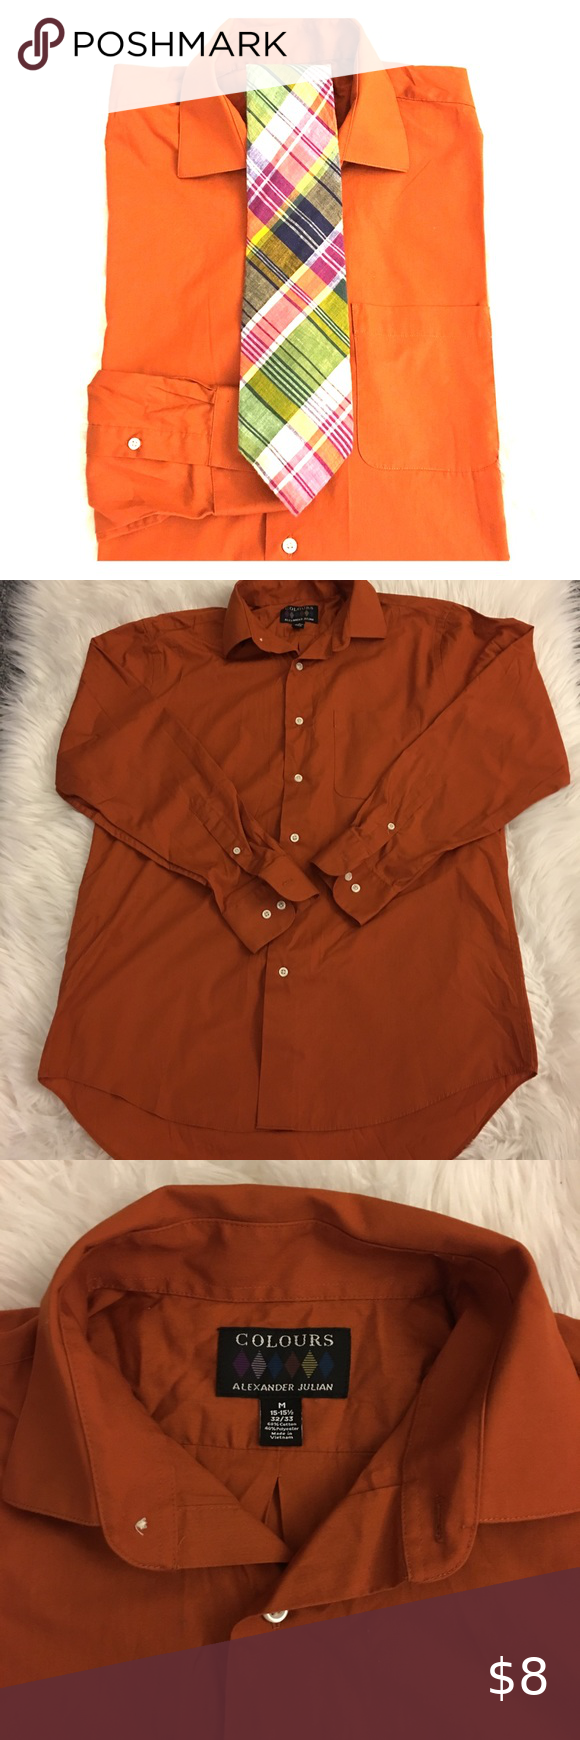 Men S Burnt Orange Dress Shirt Orange Dress Shirt Burnt Orange Dress Shirt Burnt Orange Dress [ 1740 x 580 Pixel ]